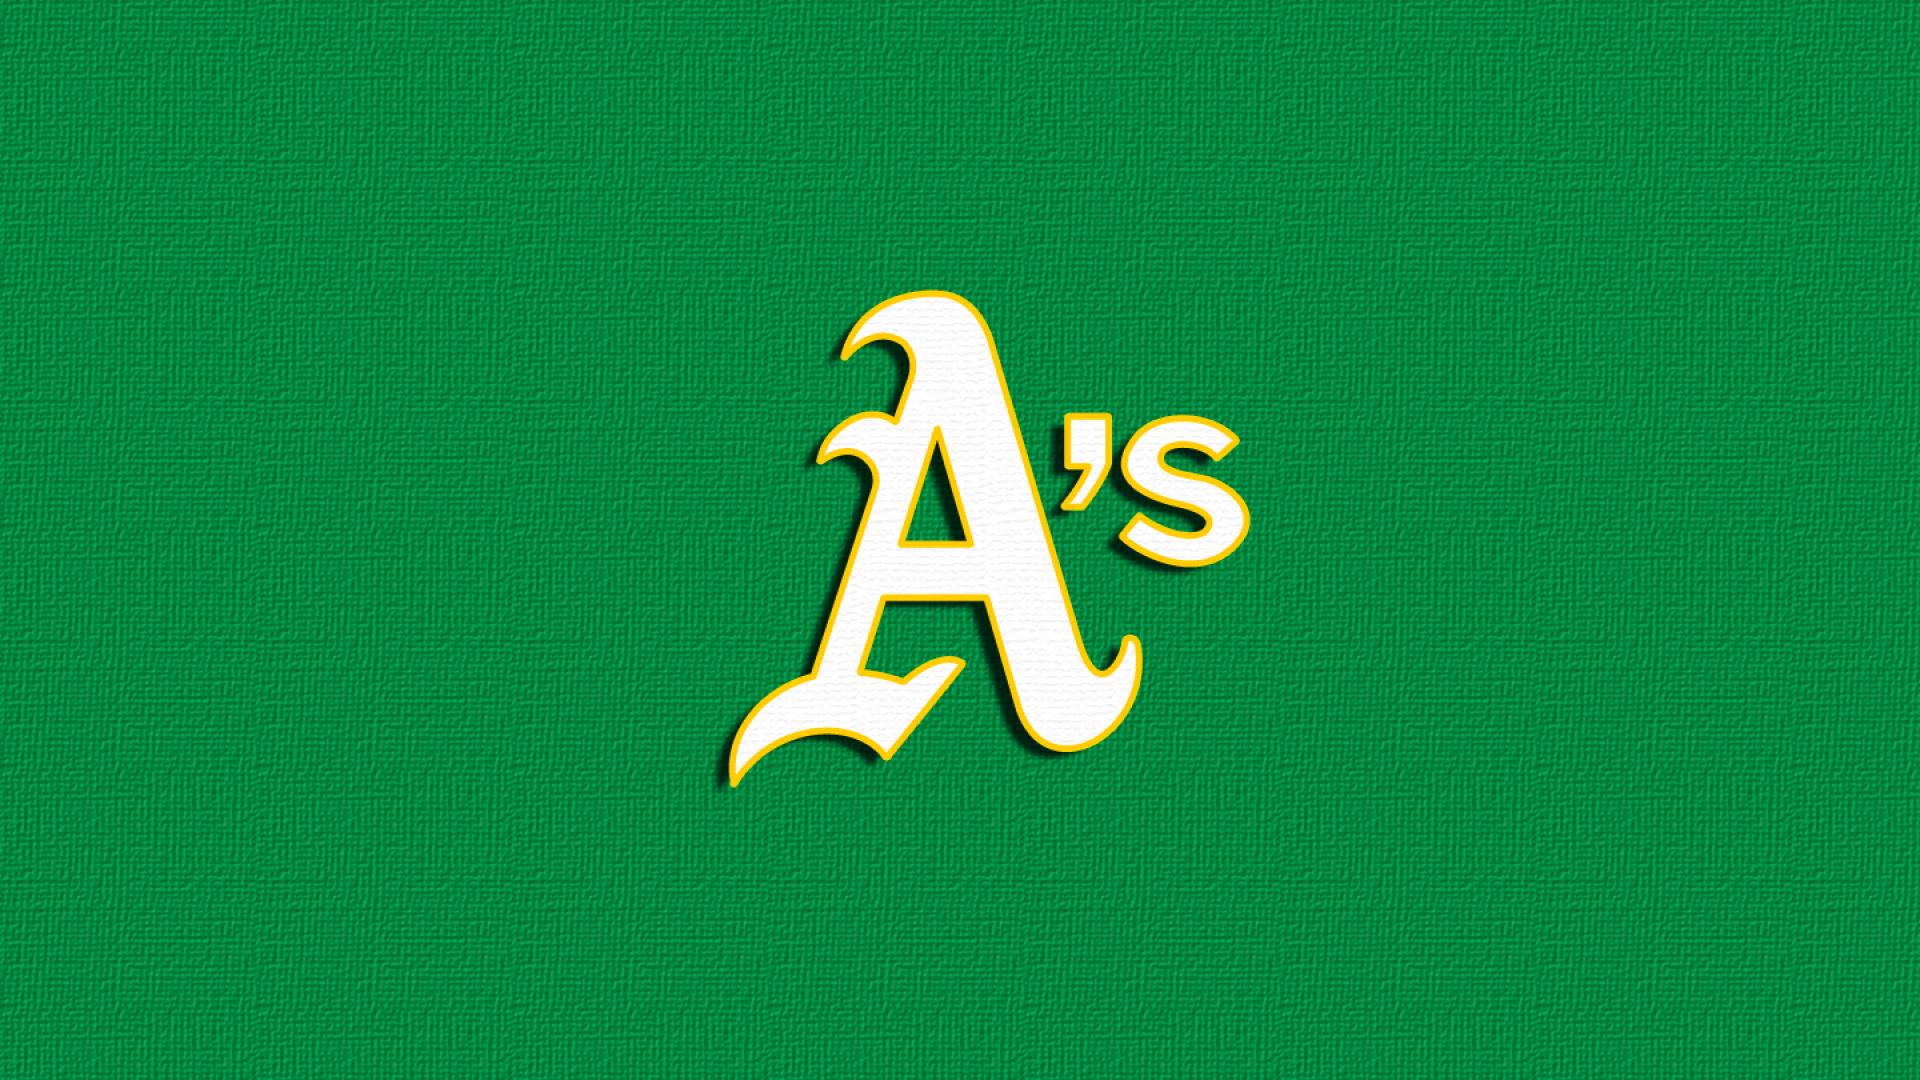 Oakland Athletics Browser Themes Desktop Wallpapers More Oakland Athletics Athlete Oakland